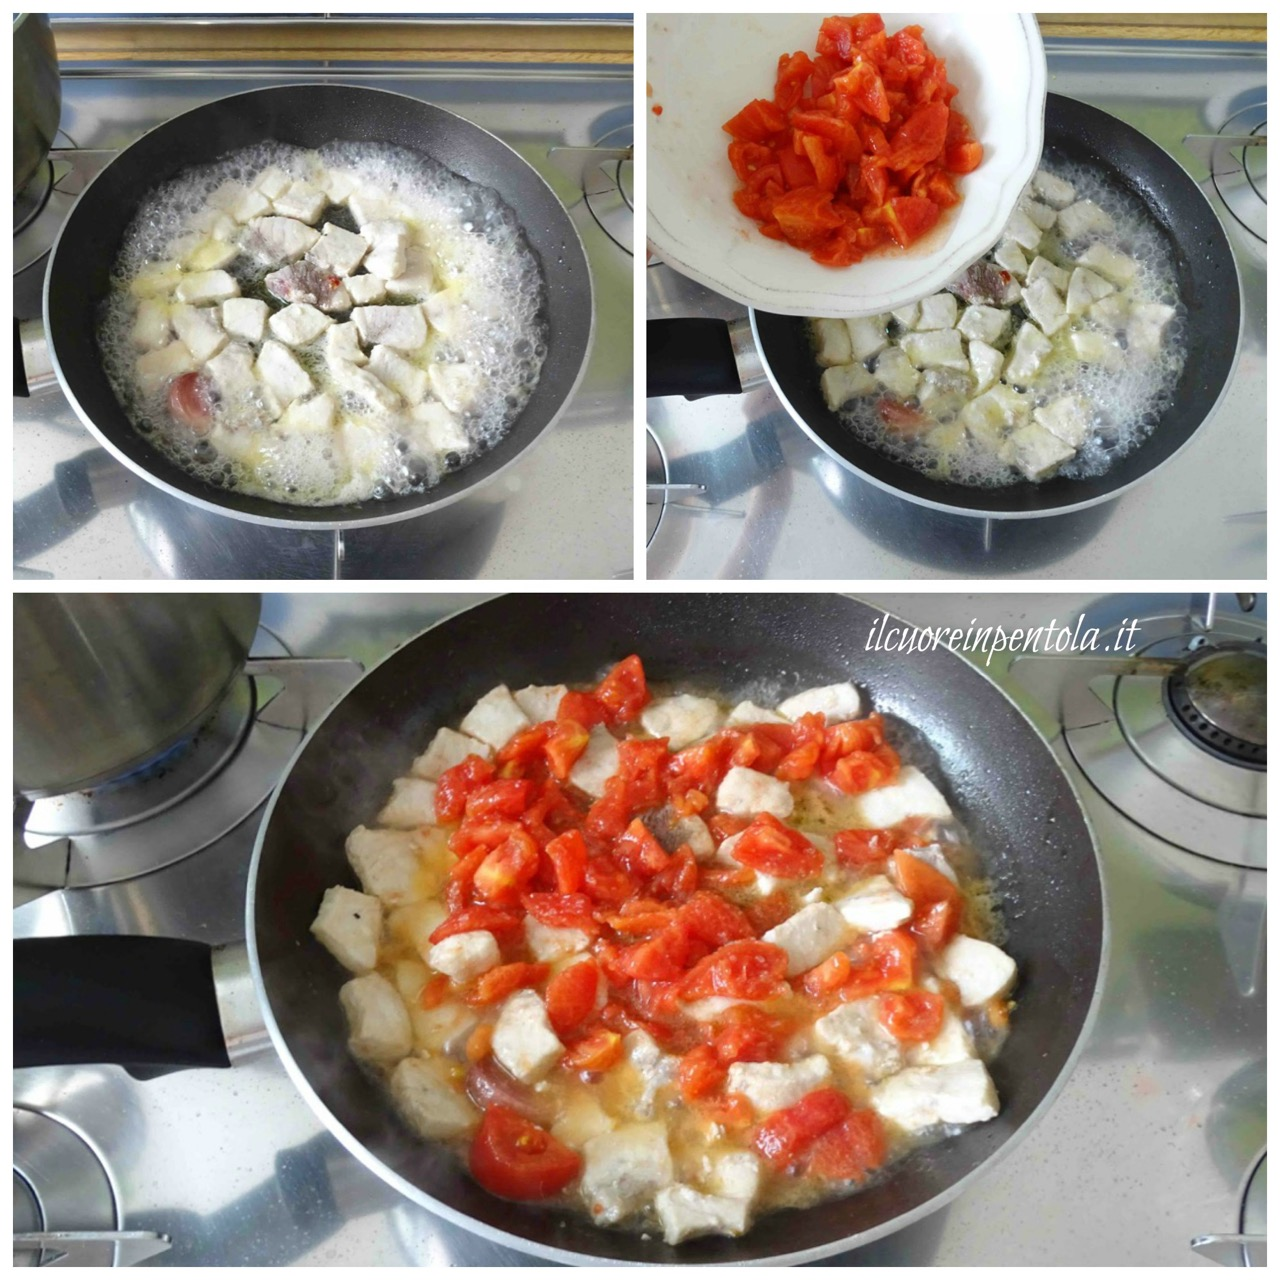 aggiungere pomodori spellati oppure pomodorini